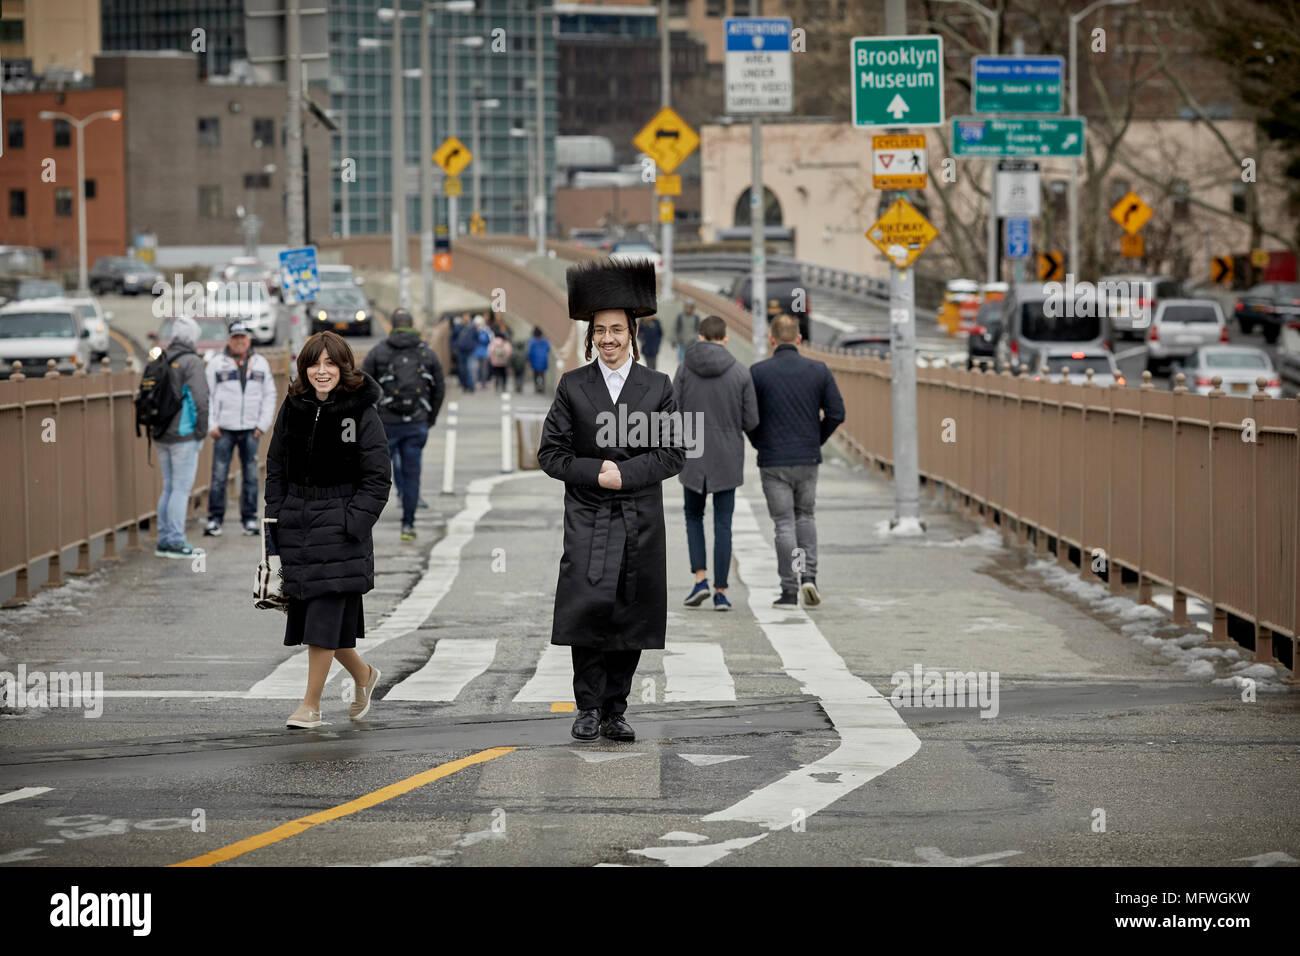 Brooklyn in New York City, Orthodox Judaism wearing shtreimel fur hat  Jewish holiday Pesach passover on Brooklyn Bridge - Stock Image